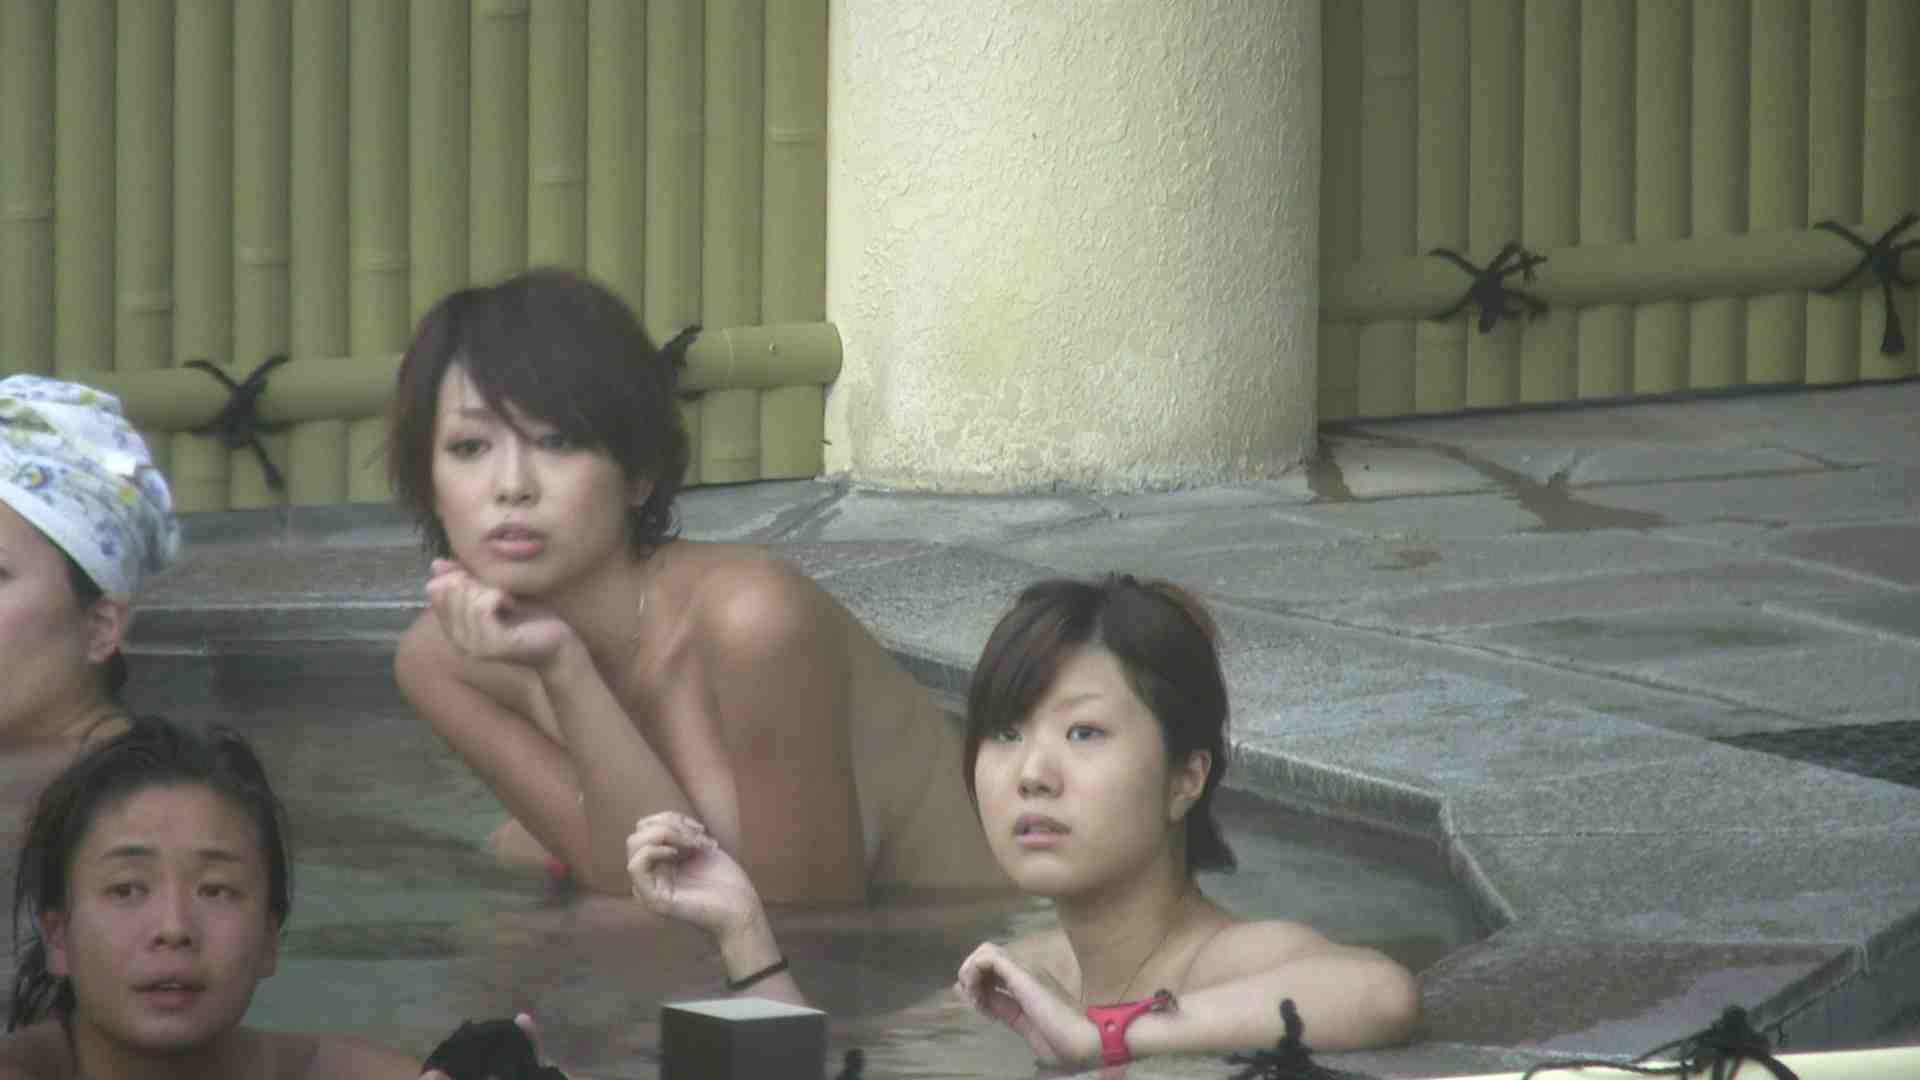 Aquaな露天風呂Vol.201 露天風呂編  102PIX 4